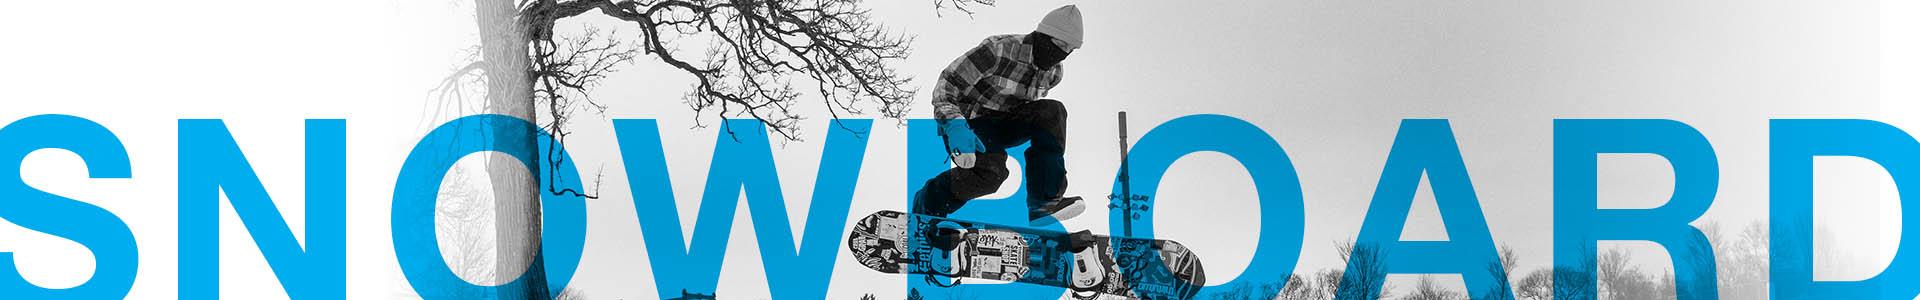 snowboard-1920x300.jpg